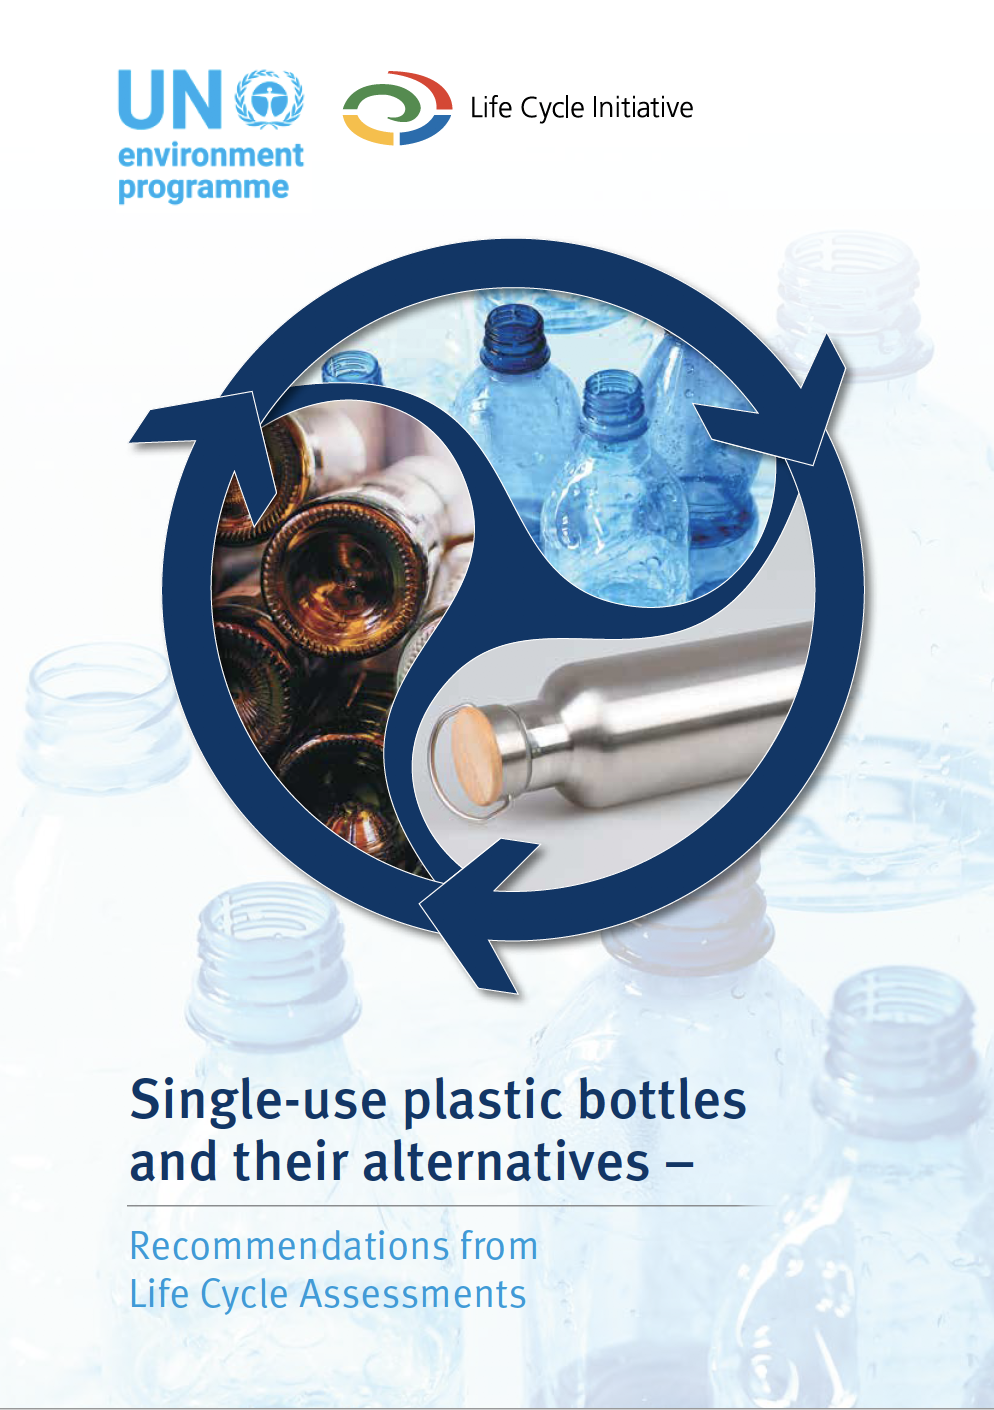 UNEP_PLASTIC BOTTLES REPORT_29 JUNE 2020_final low res